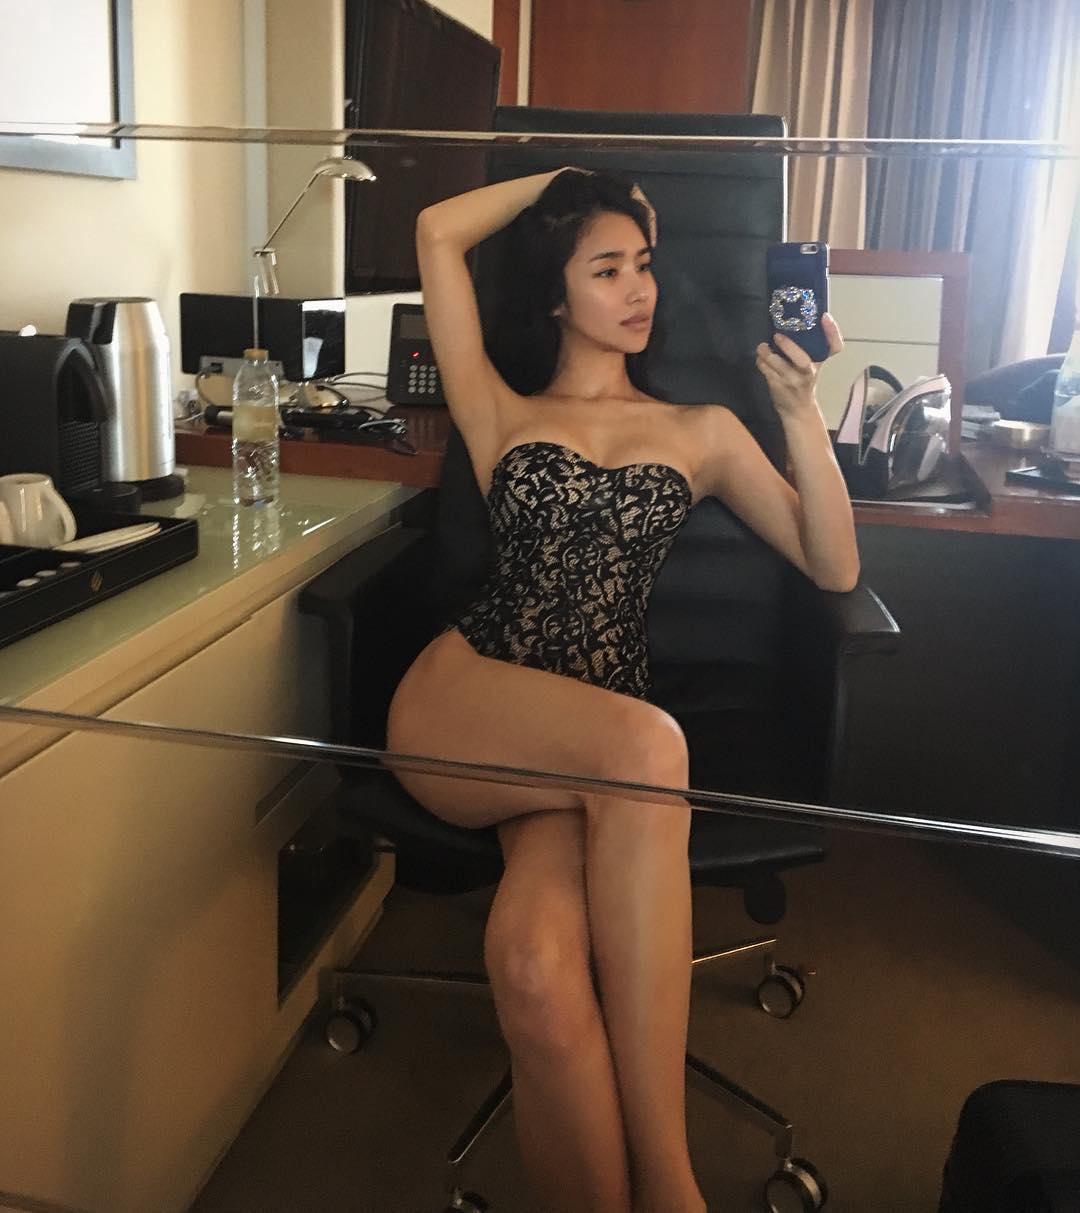 Meet this gorgeous korean model living in dubai koreaboo for Living with models